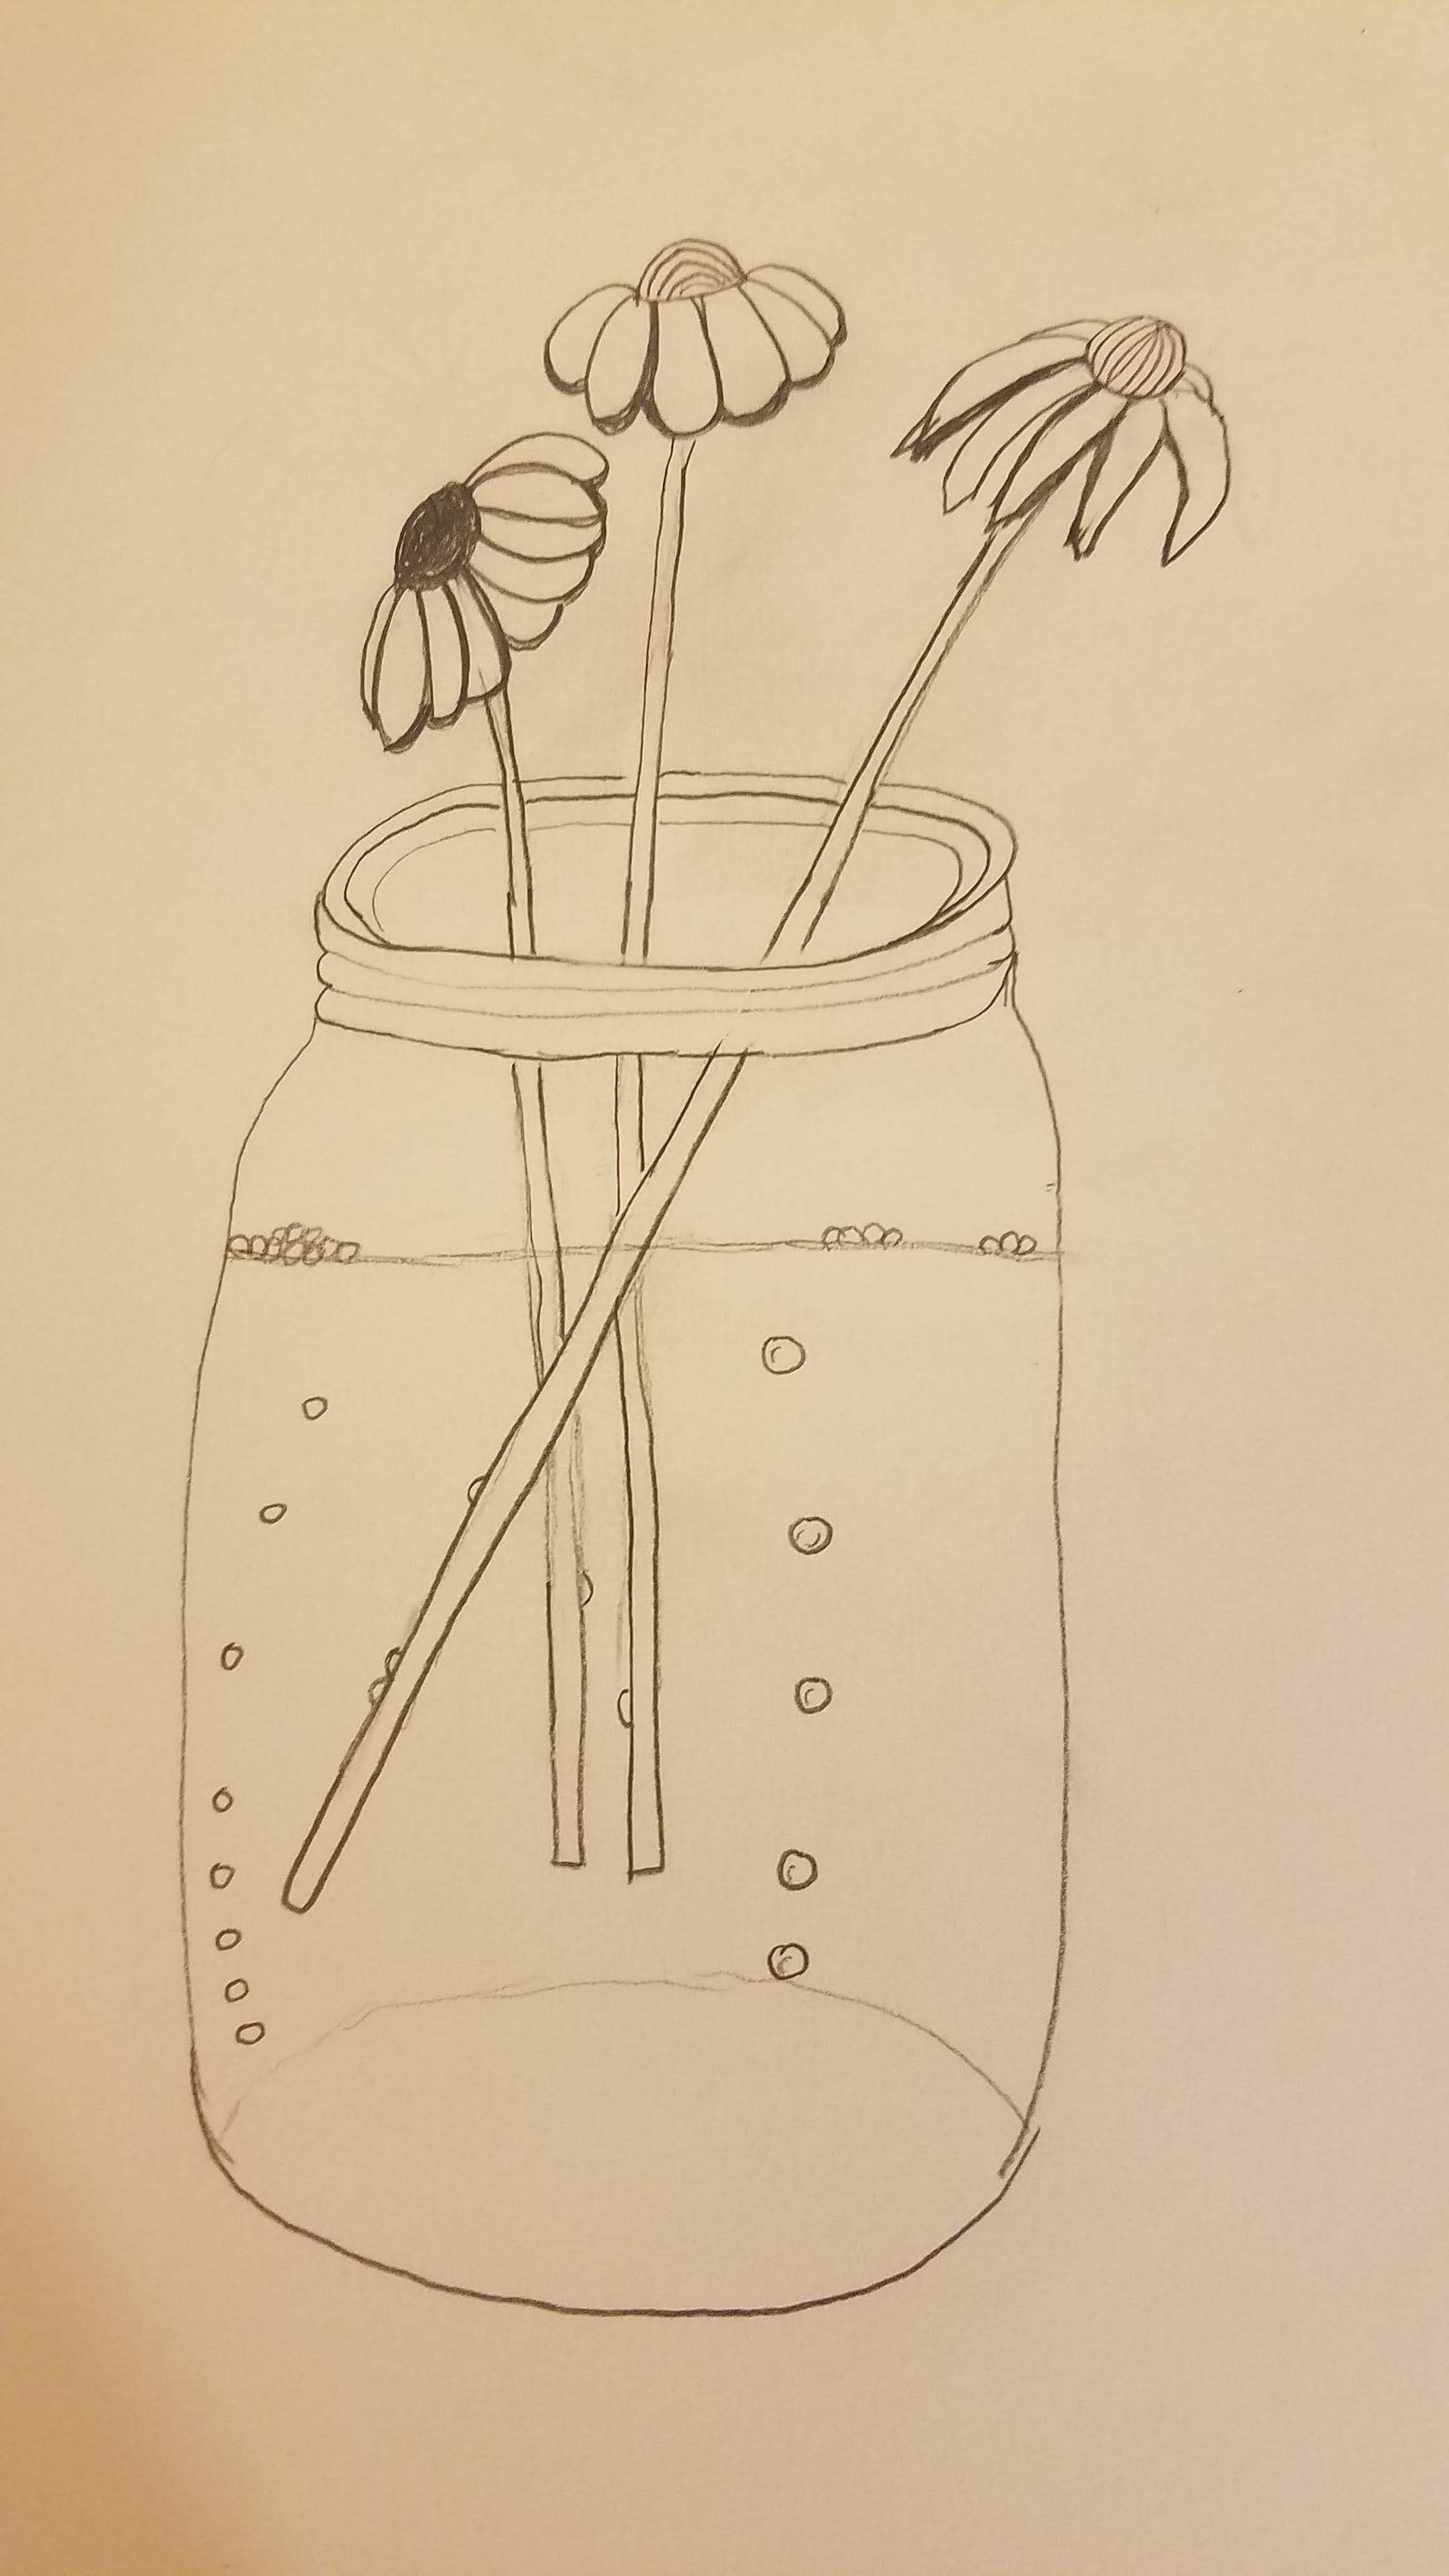 three-daisies-in-glass-mason-jar-doodle